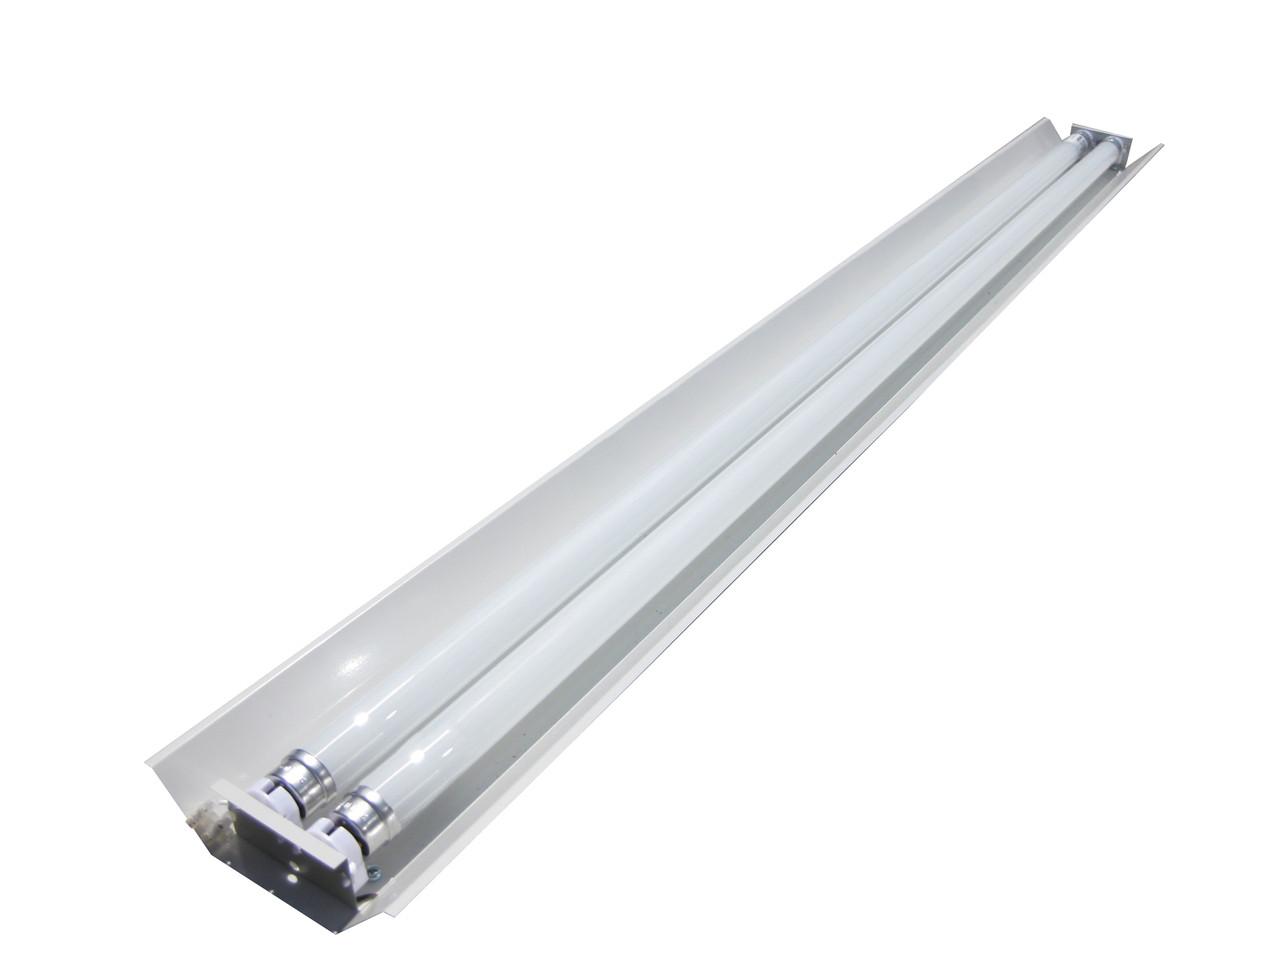 СПВ-02 (2х1200 компакт) открытый линейный светильник под LED (ЛЕД) лампы Т8 1200 без ПРА